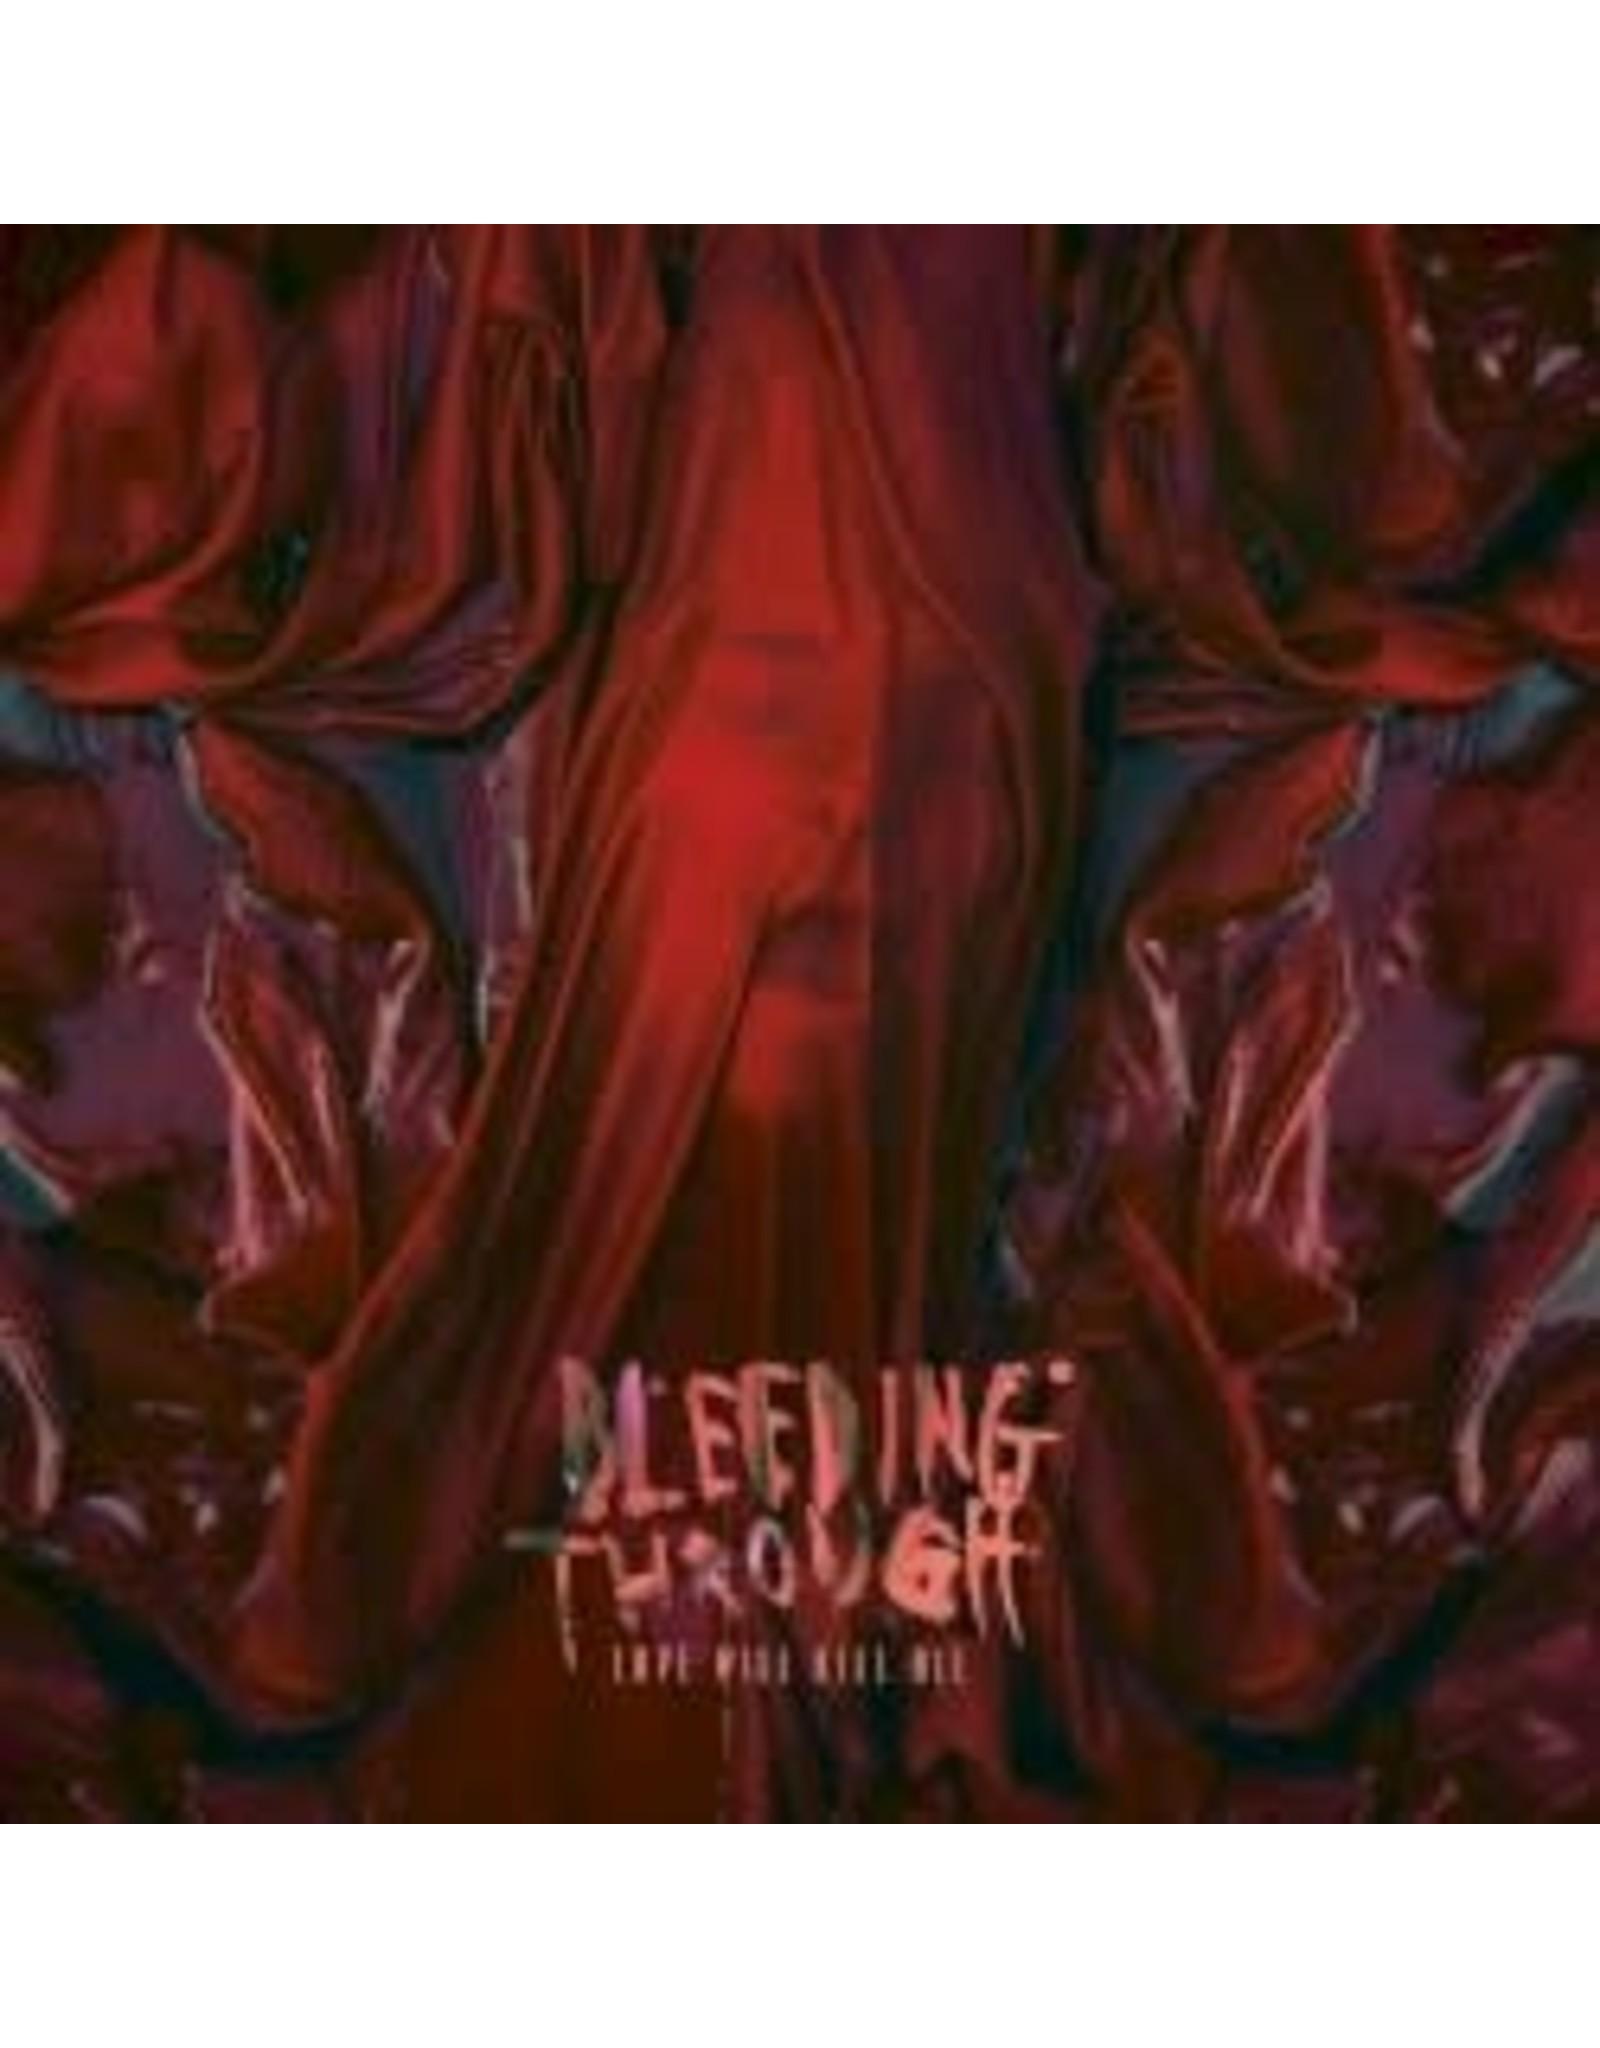 Bleeding Through - Love Will Kill All (Transparent Red Vinyl - Ltd to 500 copies) LP